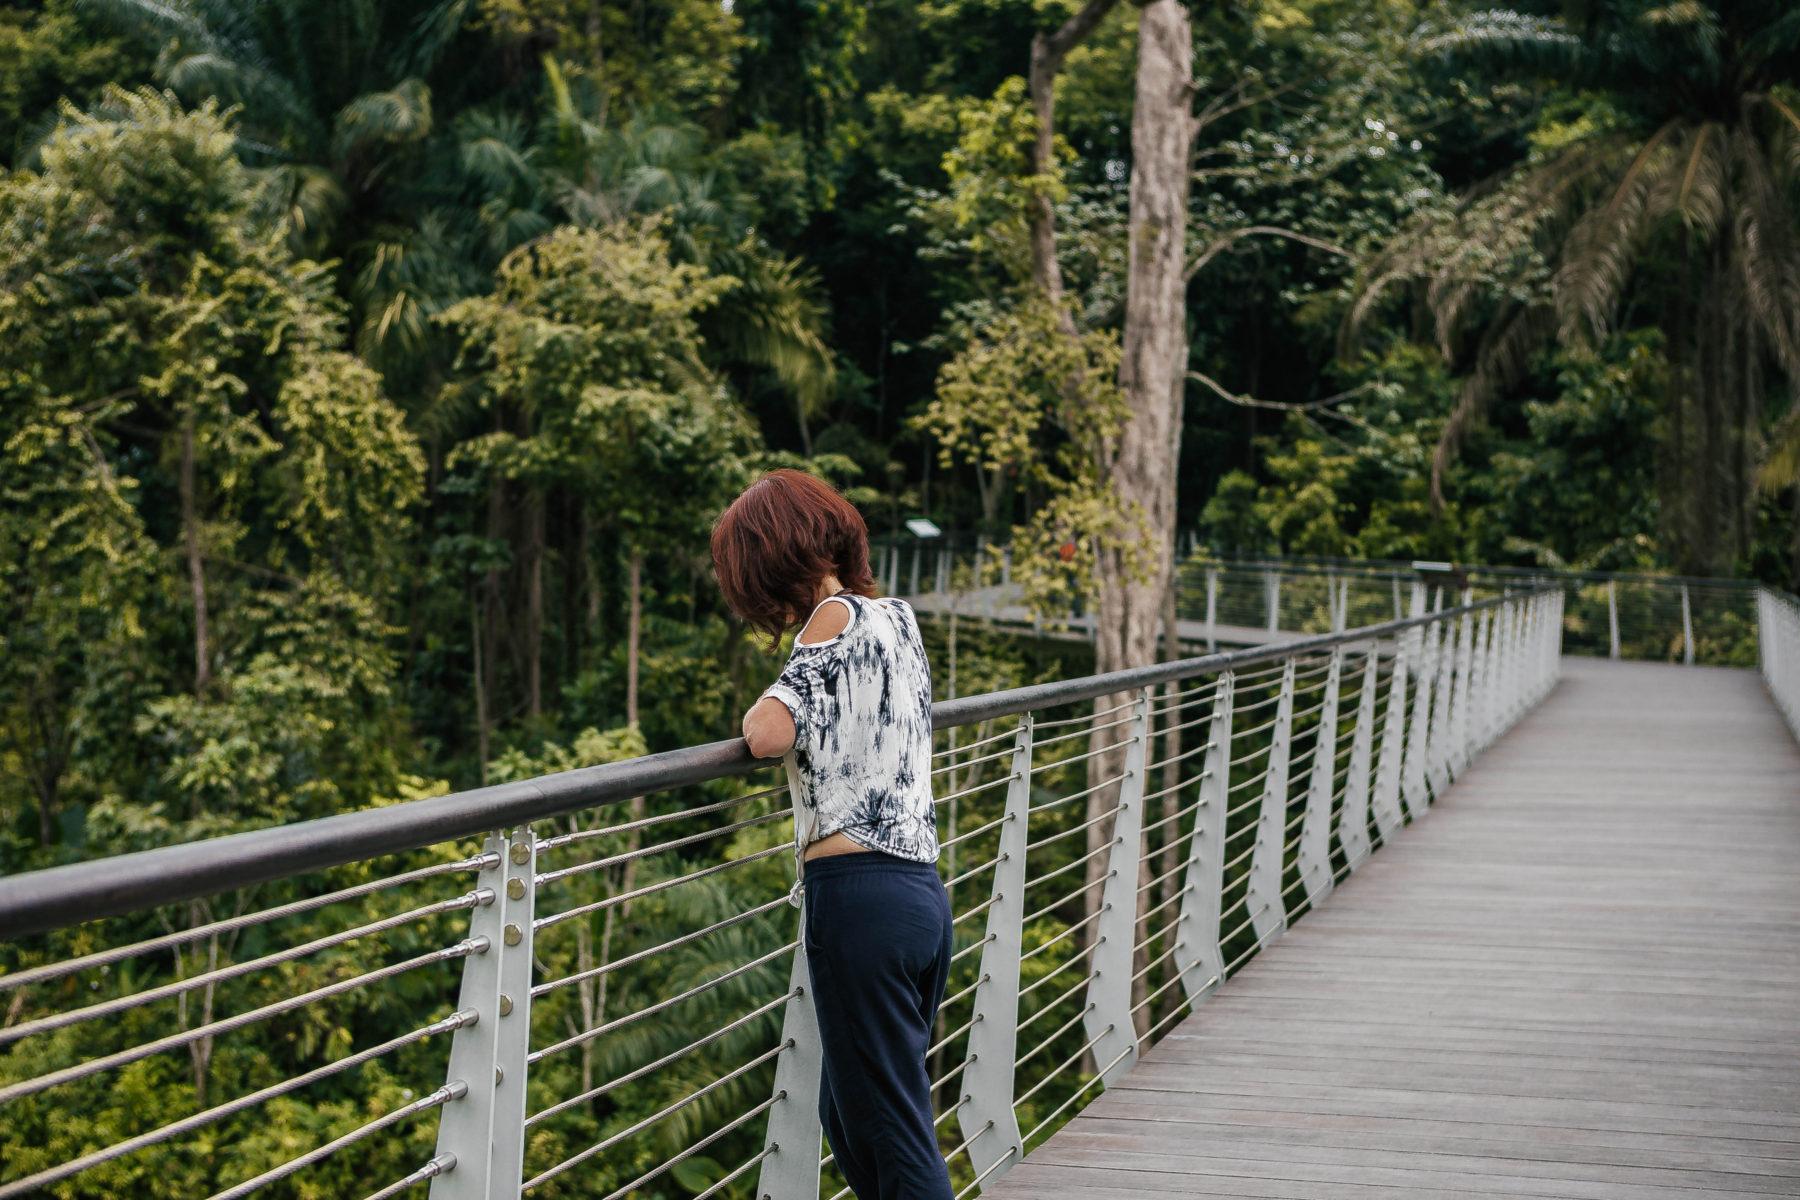 singapore green botanical gardens city escape exploring lush